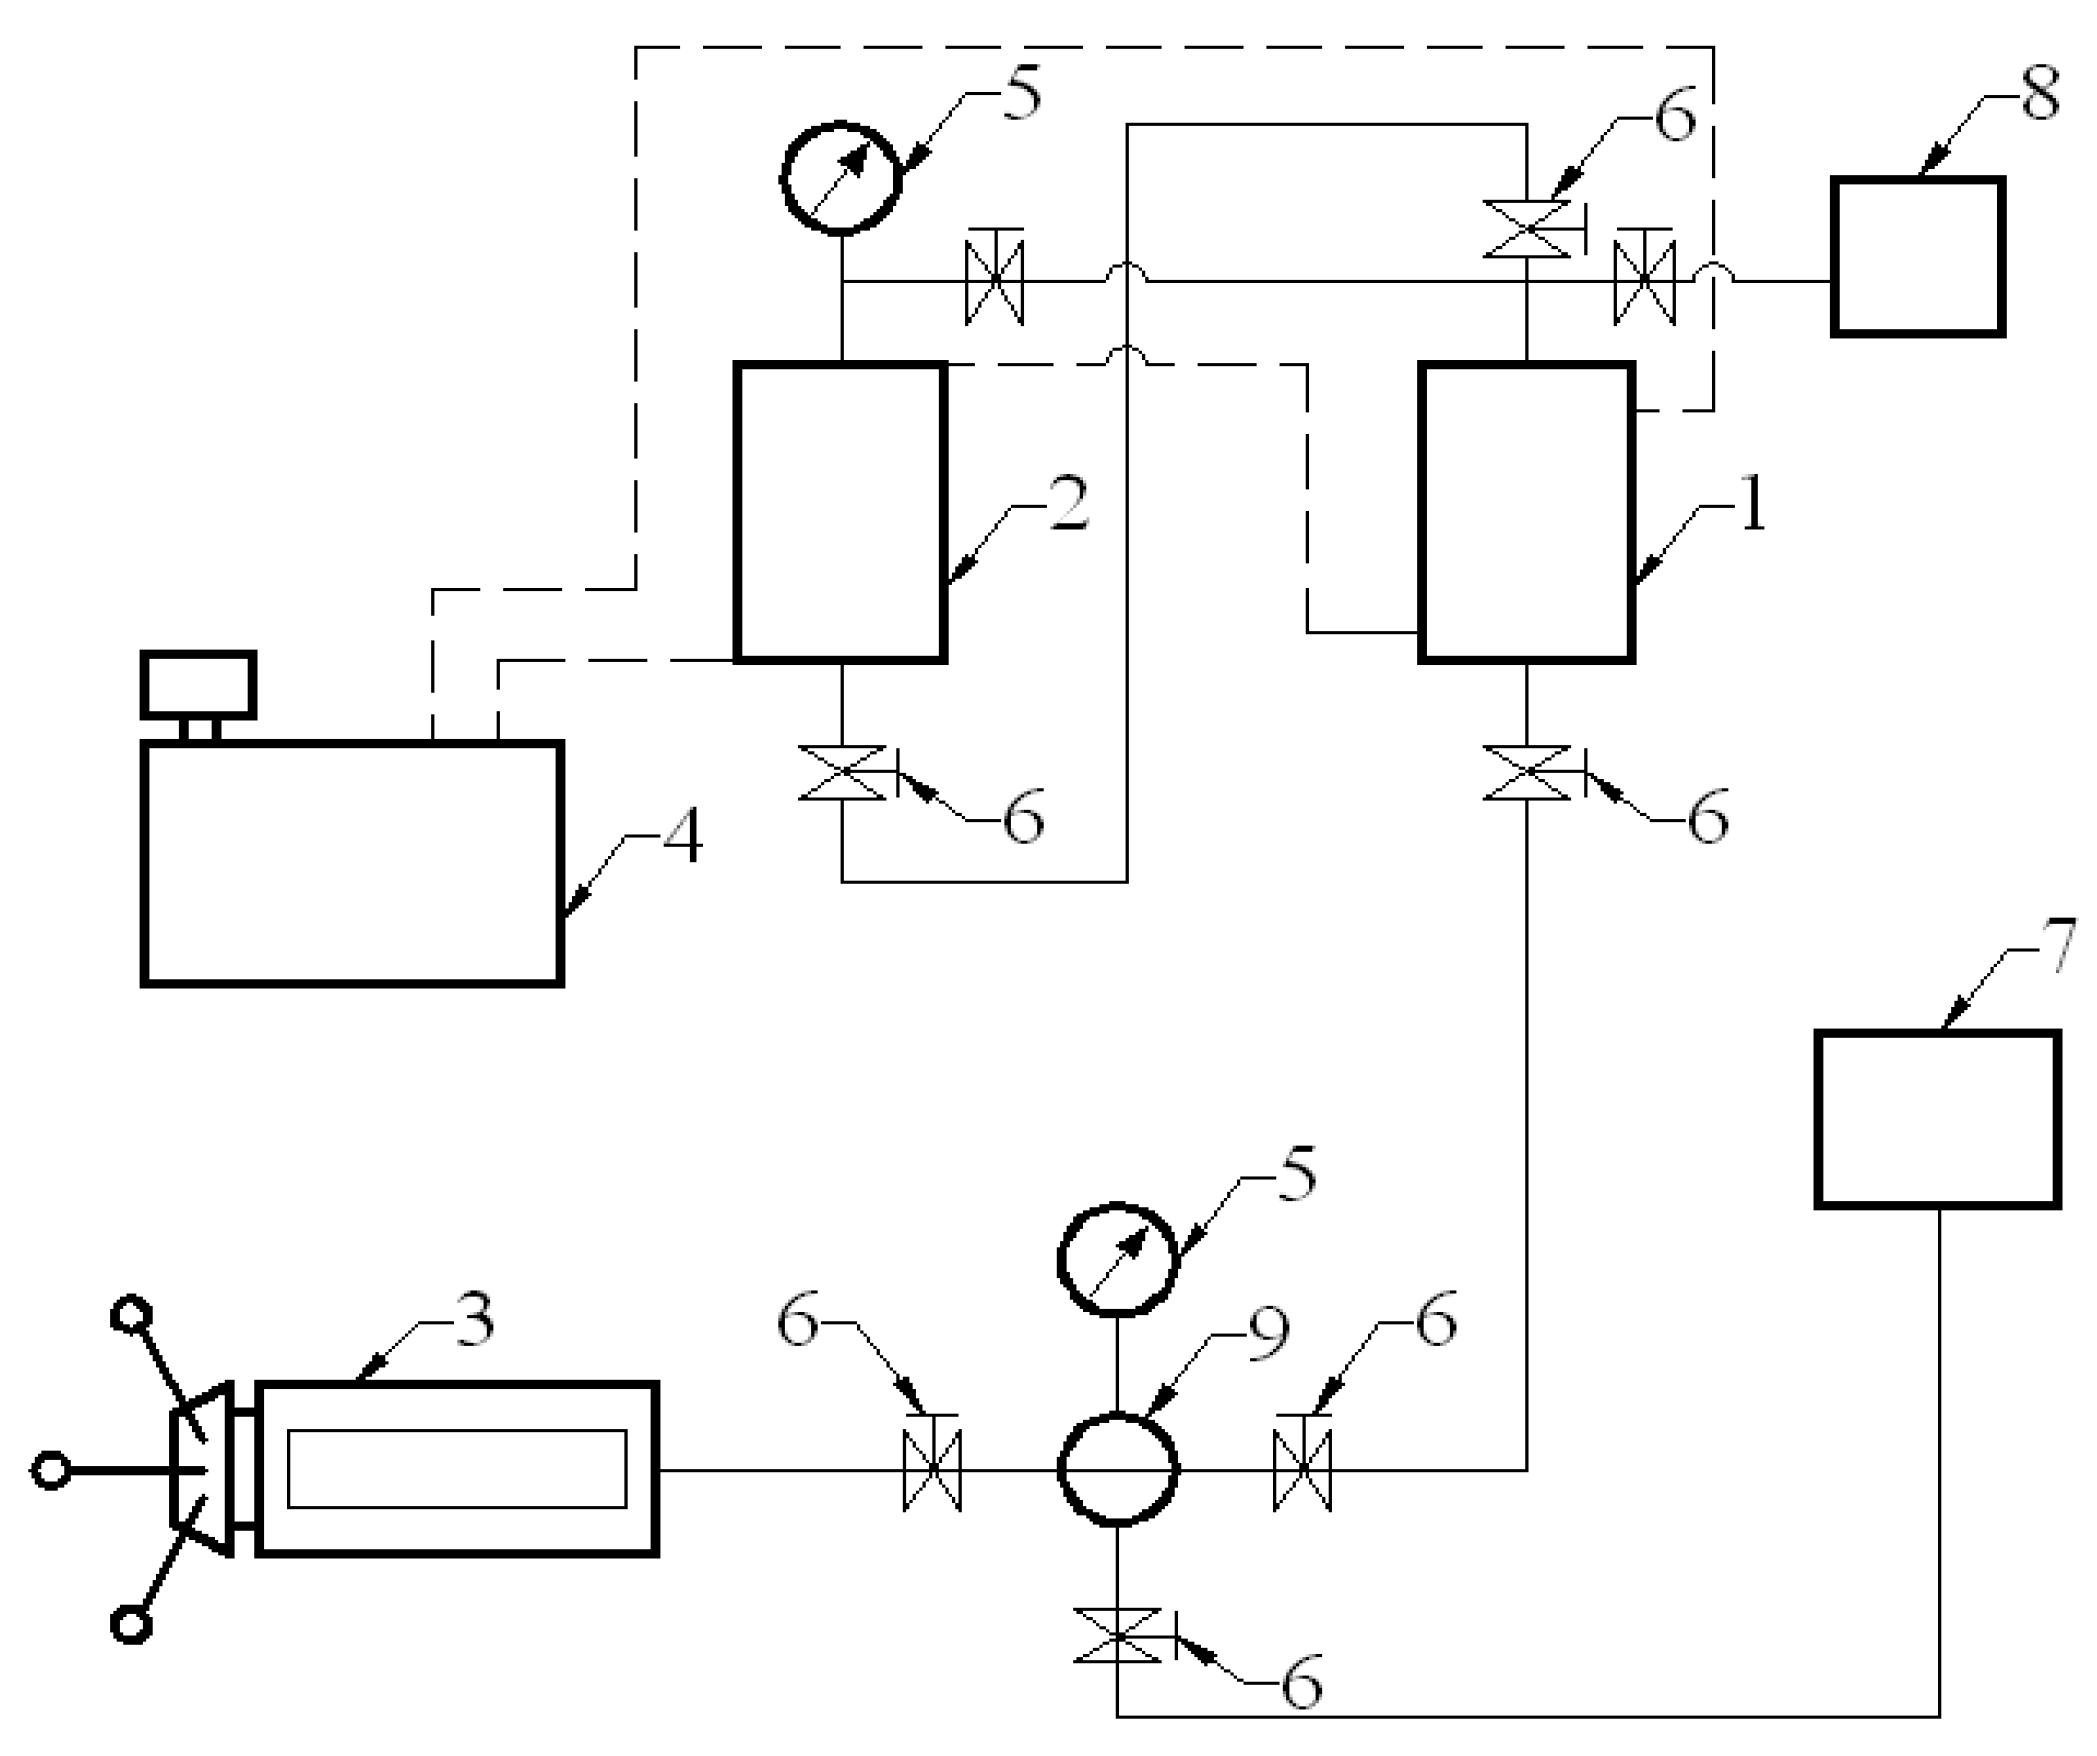 Square D Surge Protector Wiring Diagram Surge Arrestor